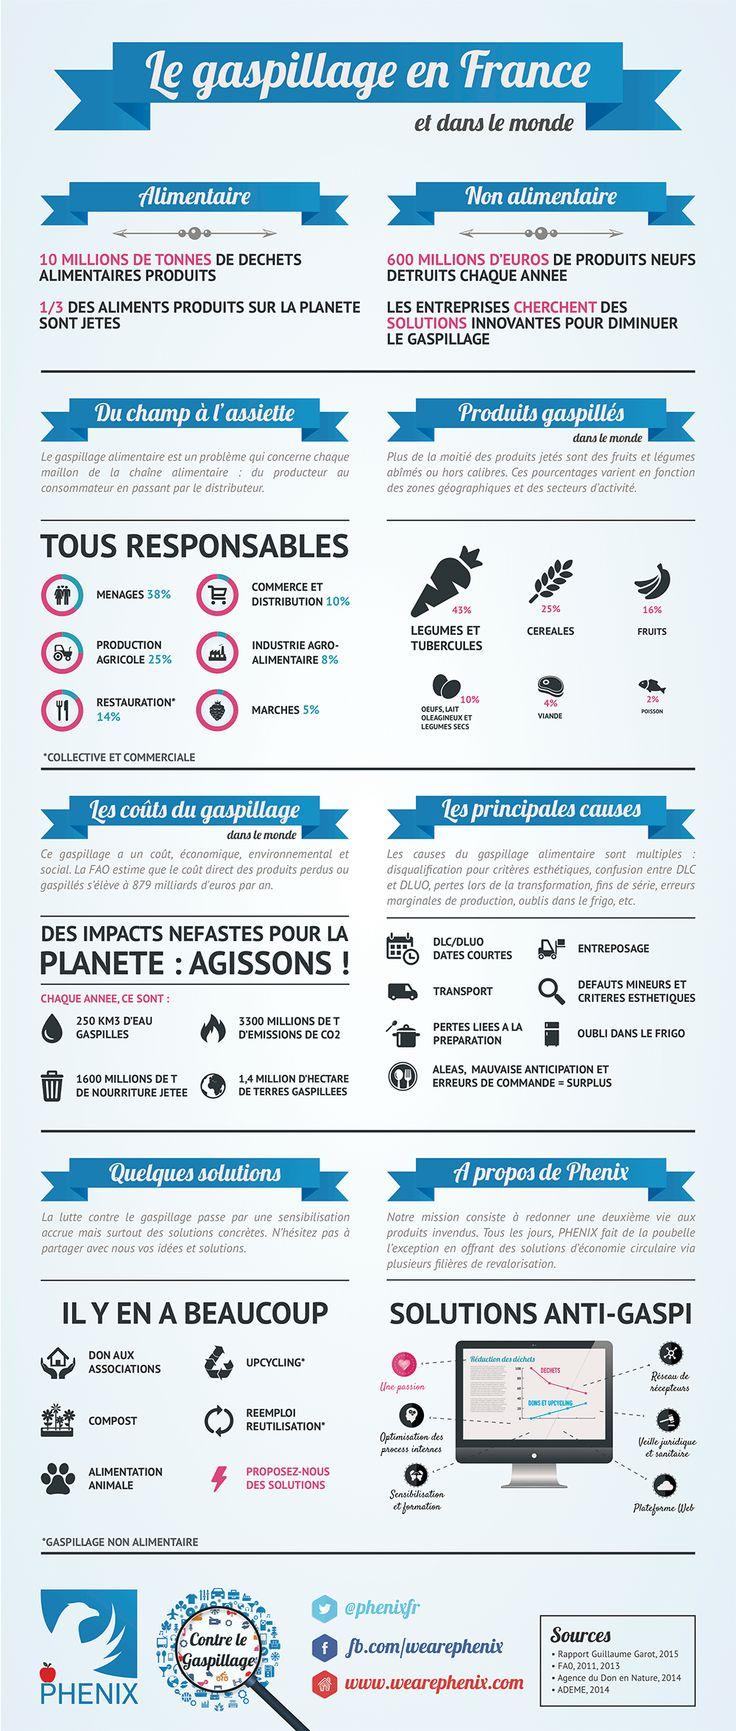 Phenix evolution tarif elegant prix maison phenix with for Tarif extension